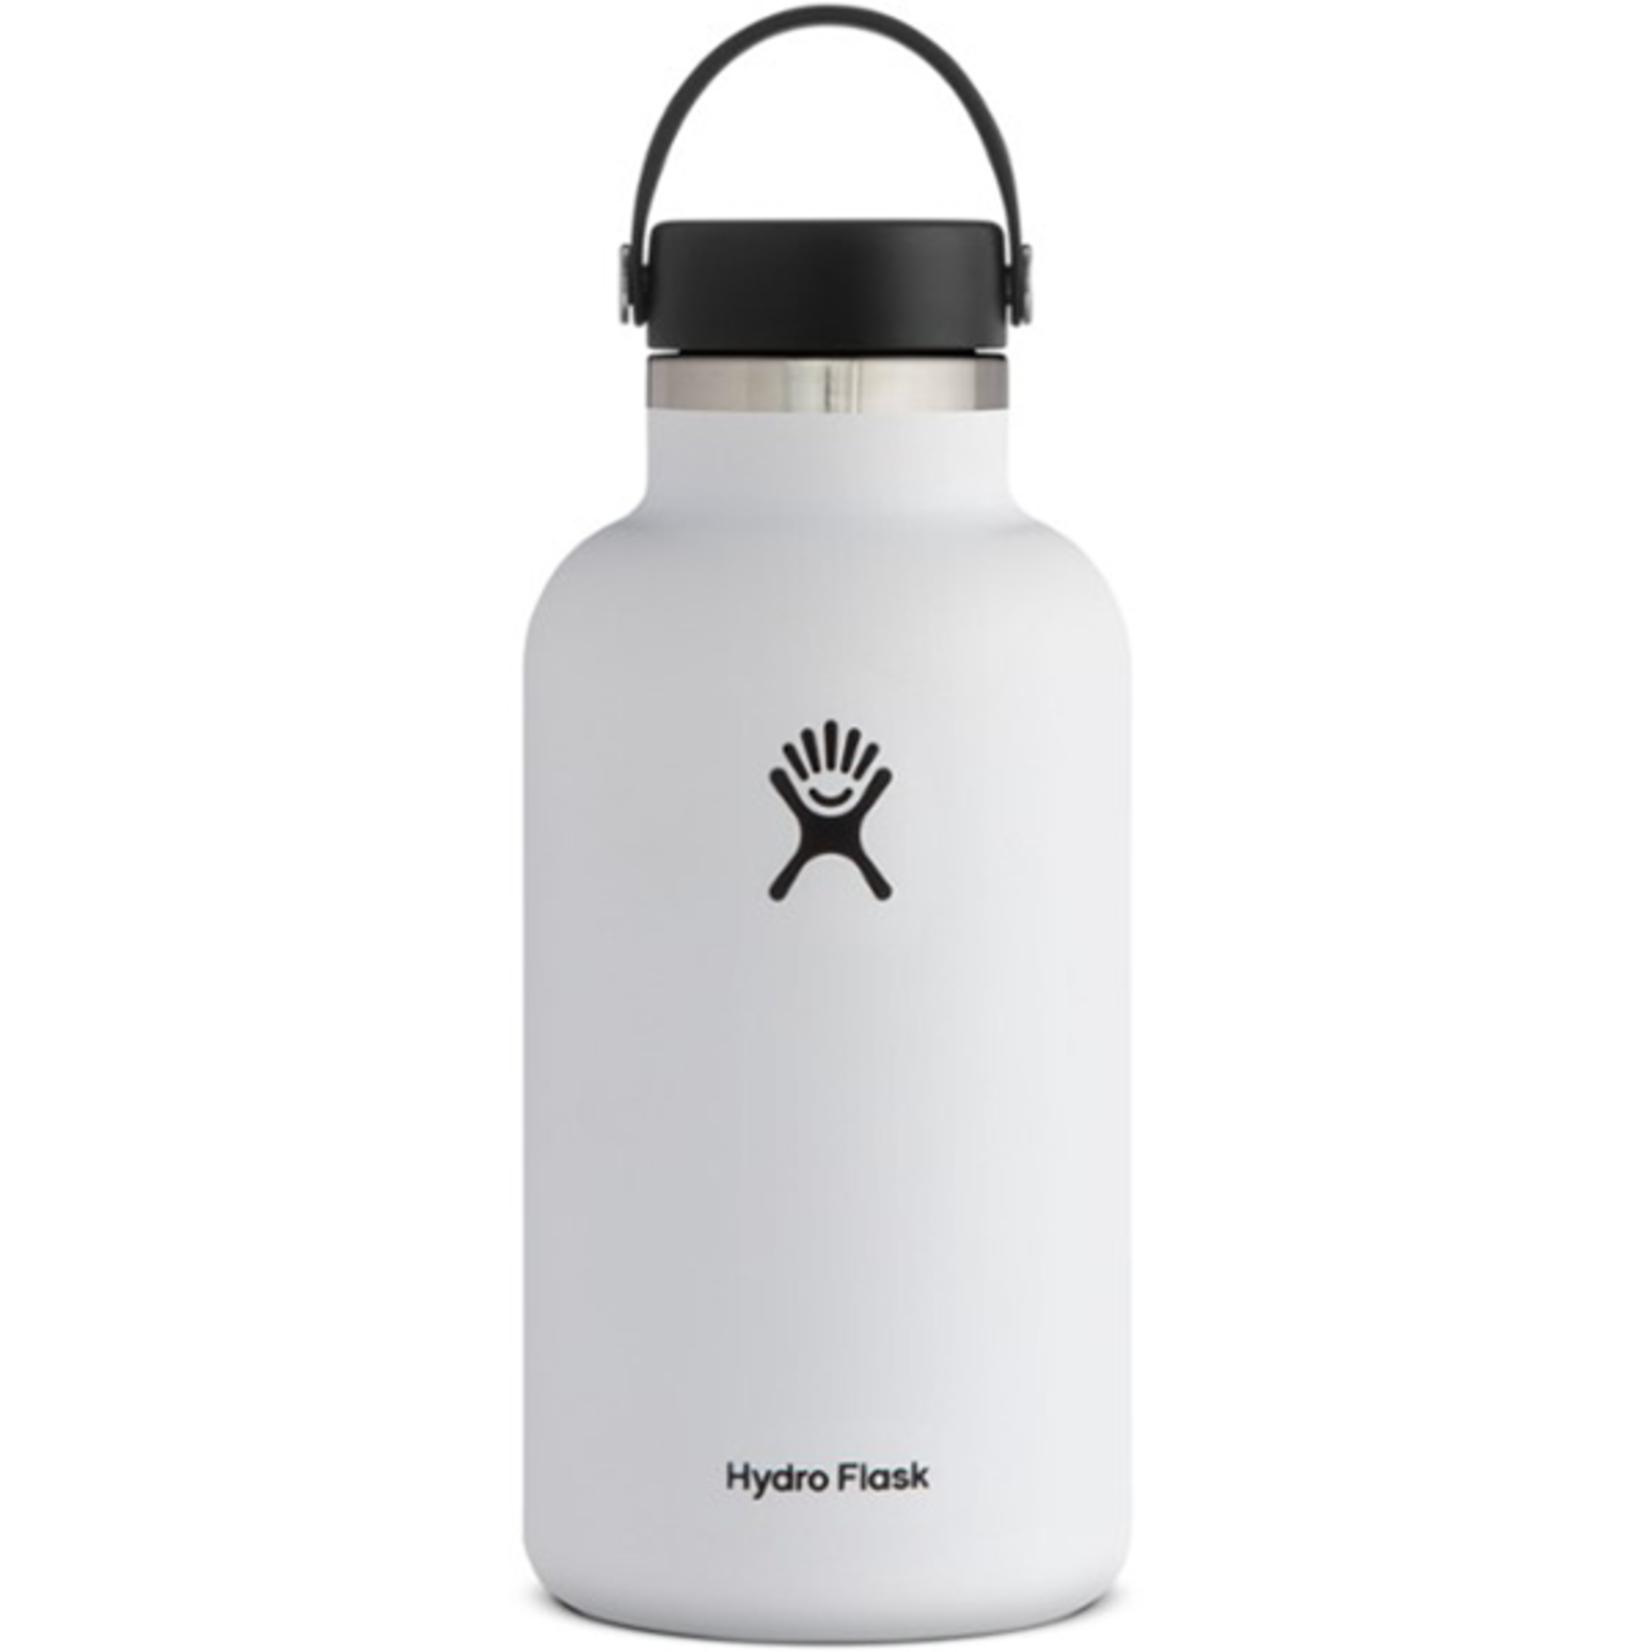 Hydroflask Widemouth White 64oz